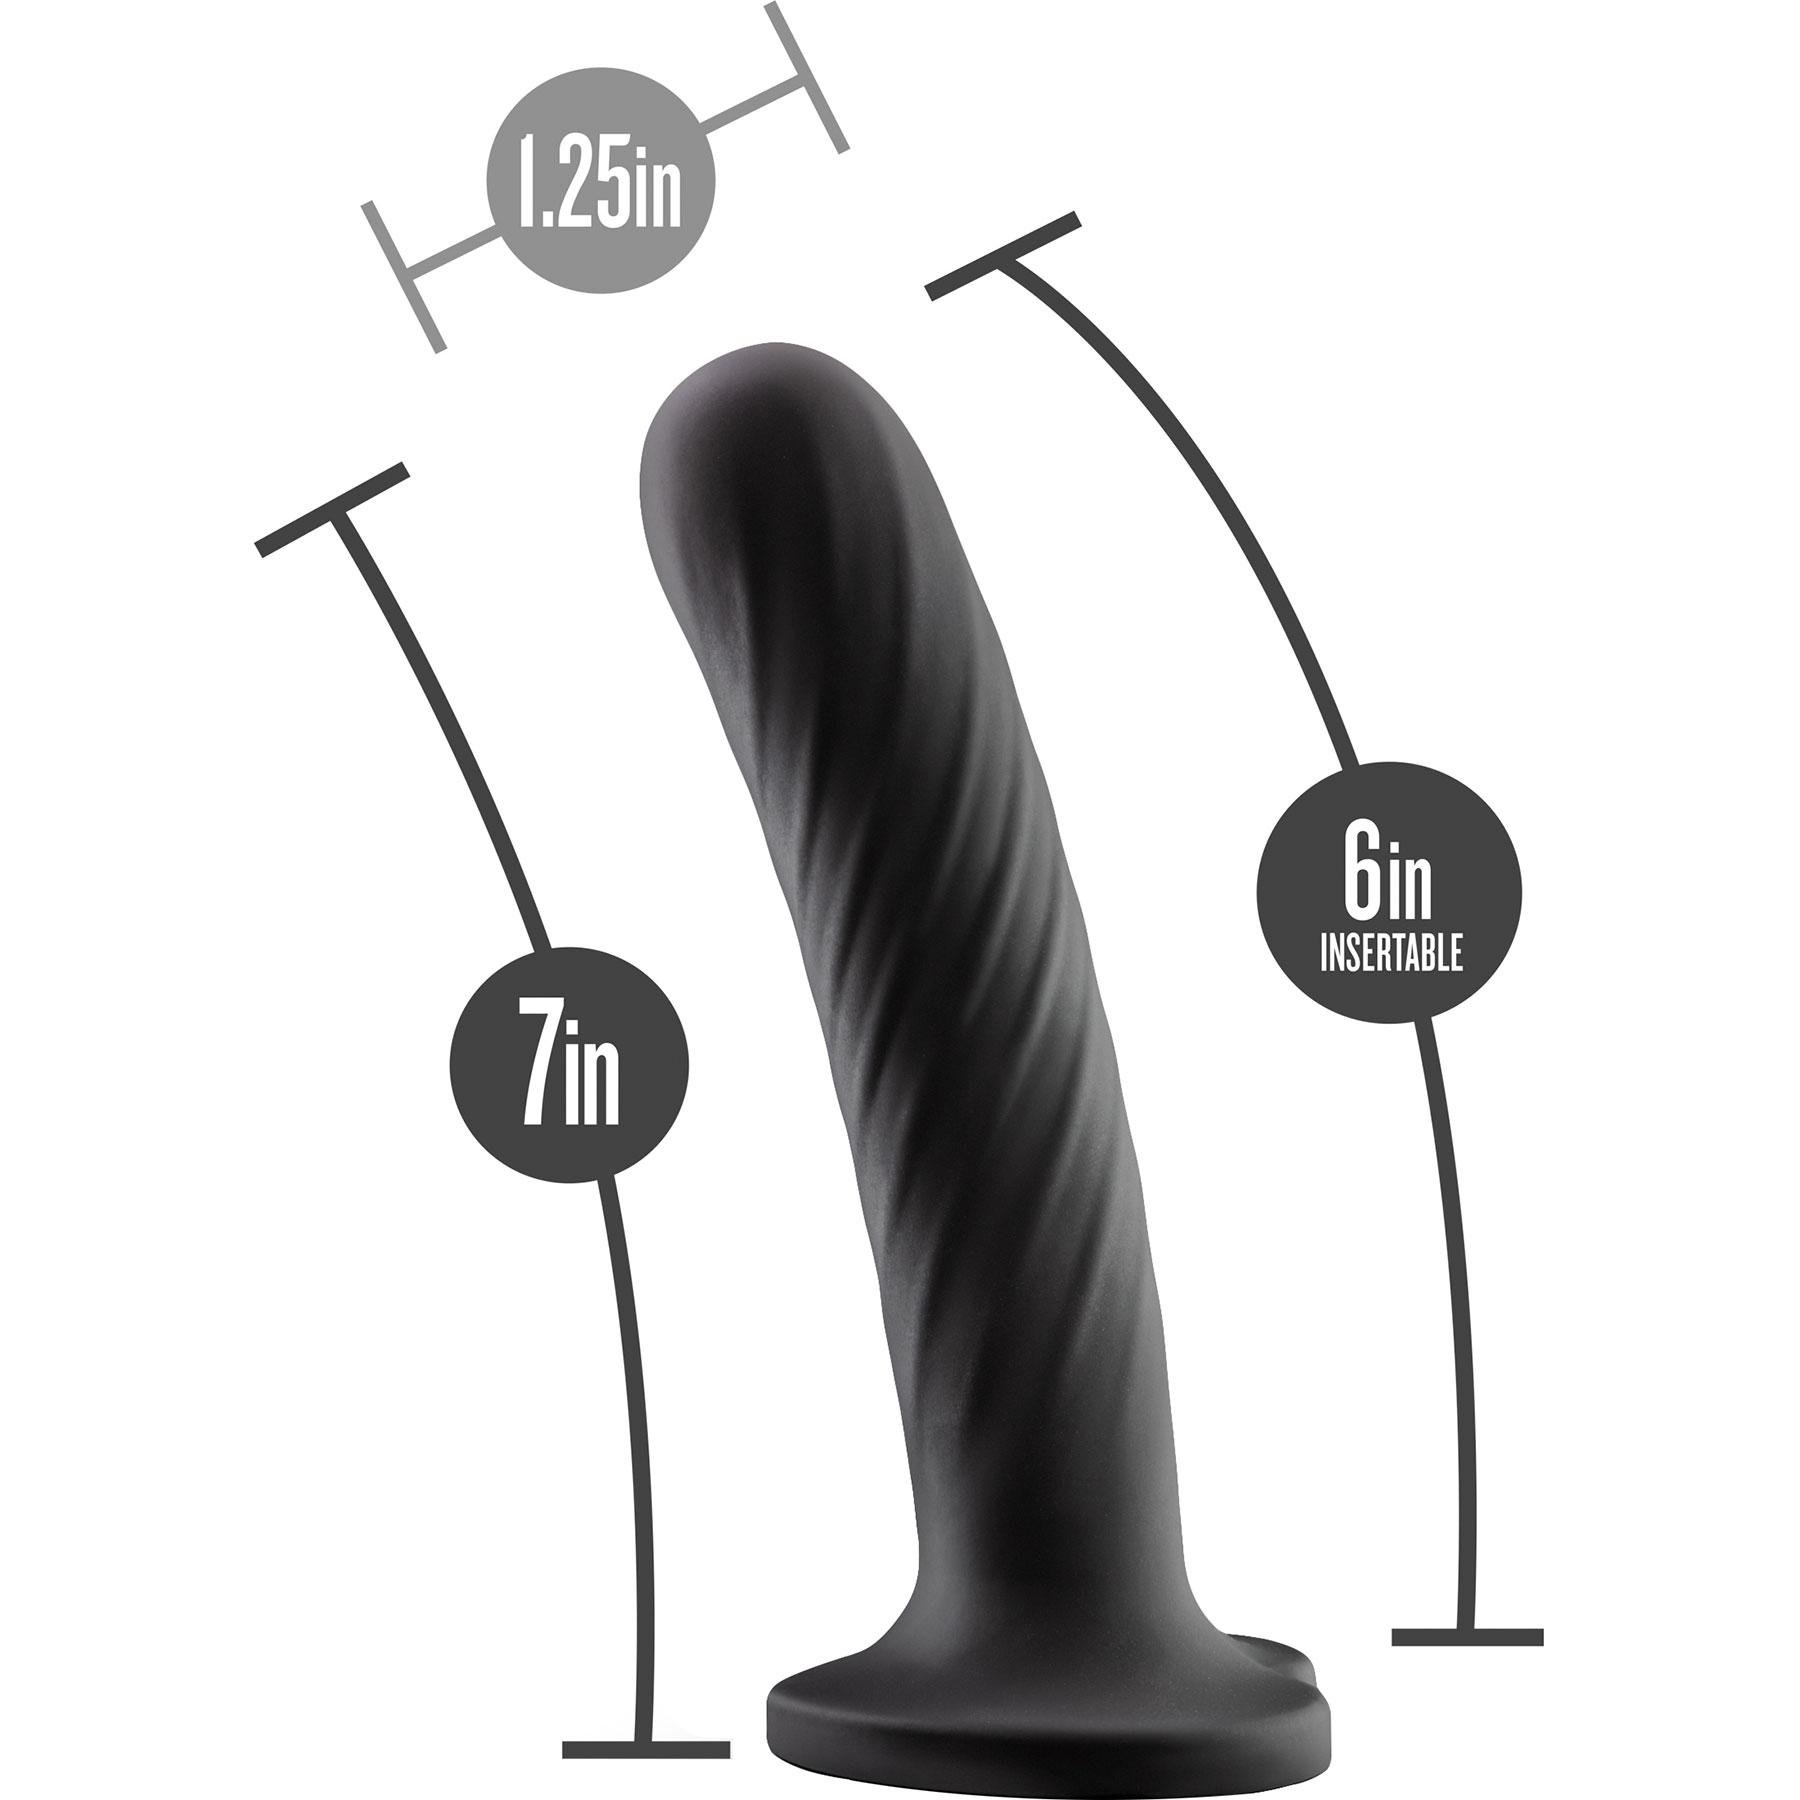 Temptasia Twist Silicone Dildo By Blush Large - Measurement